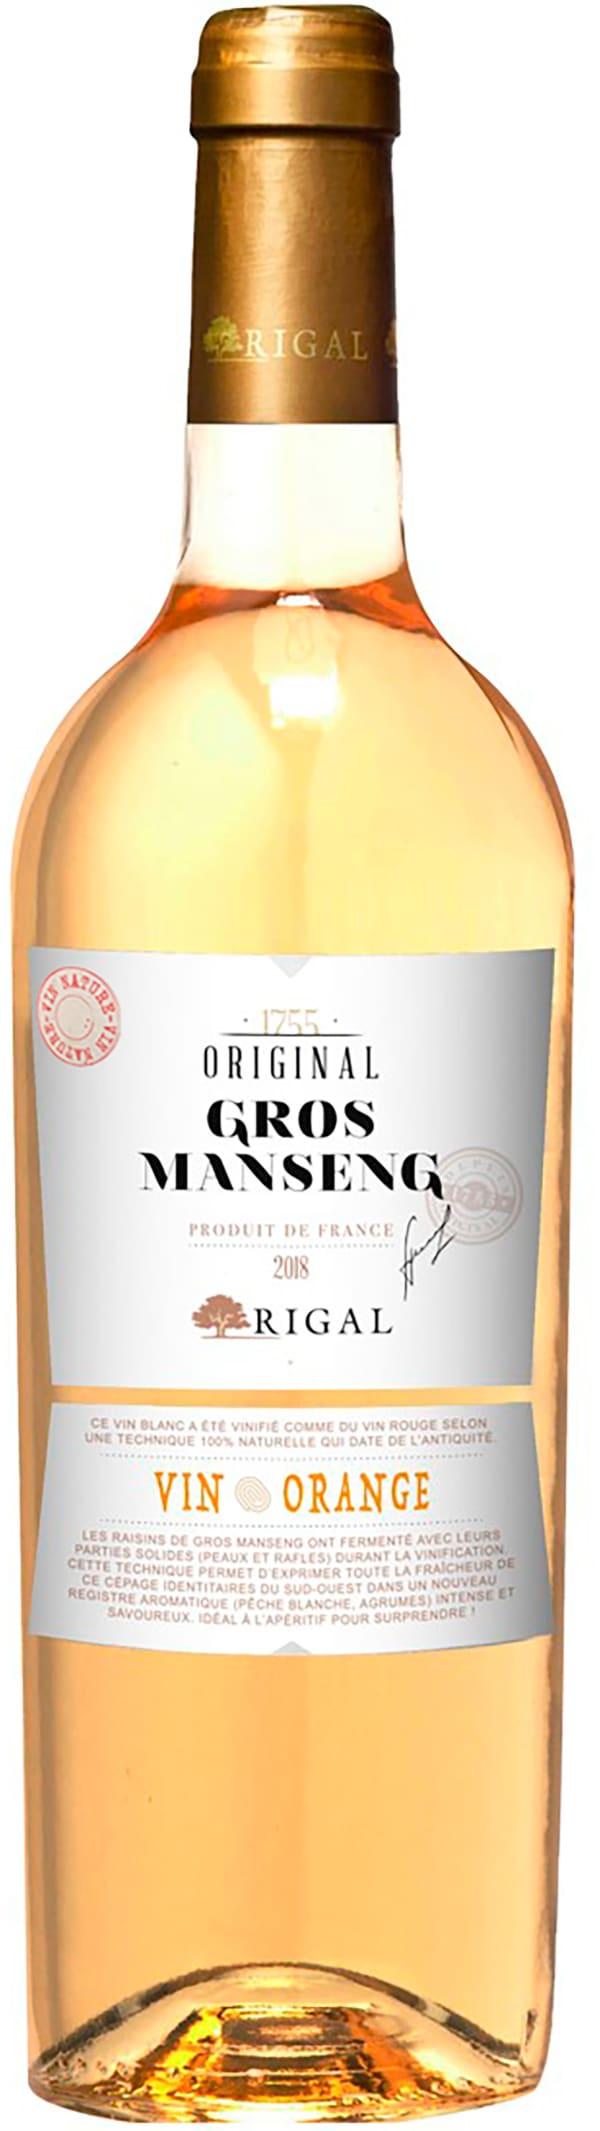 Rigal Original Gros Manseng Vin Orange 2020